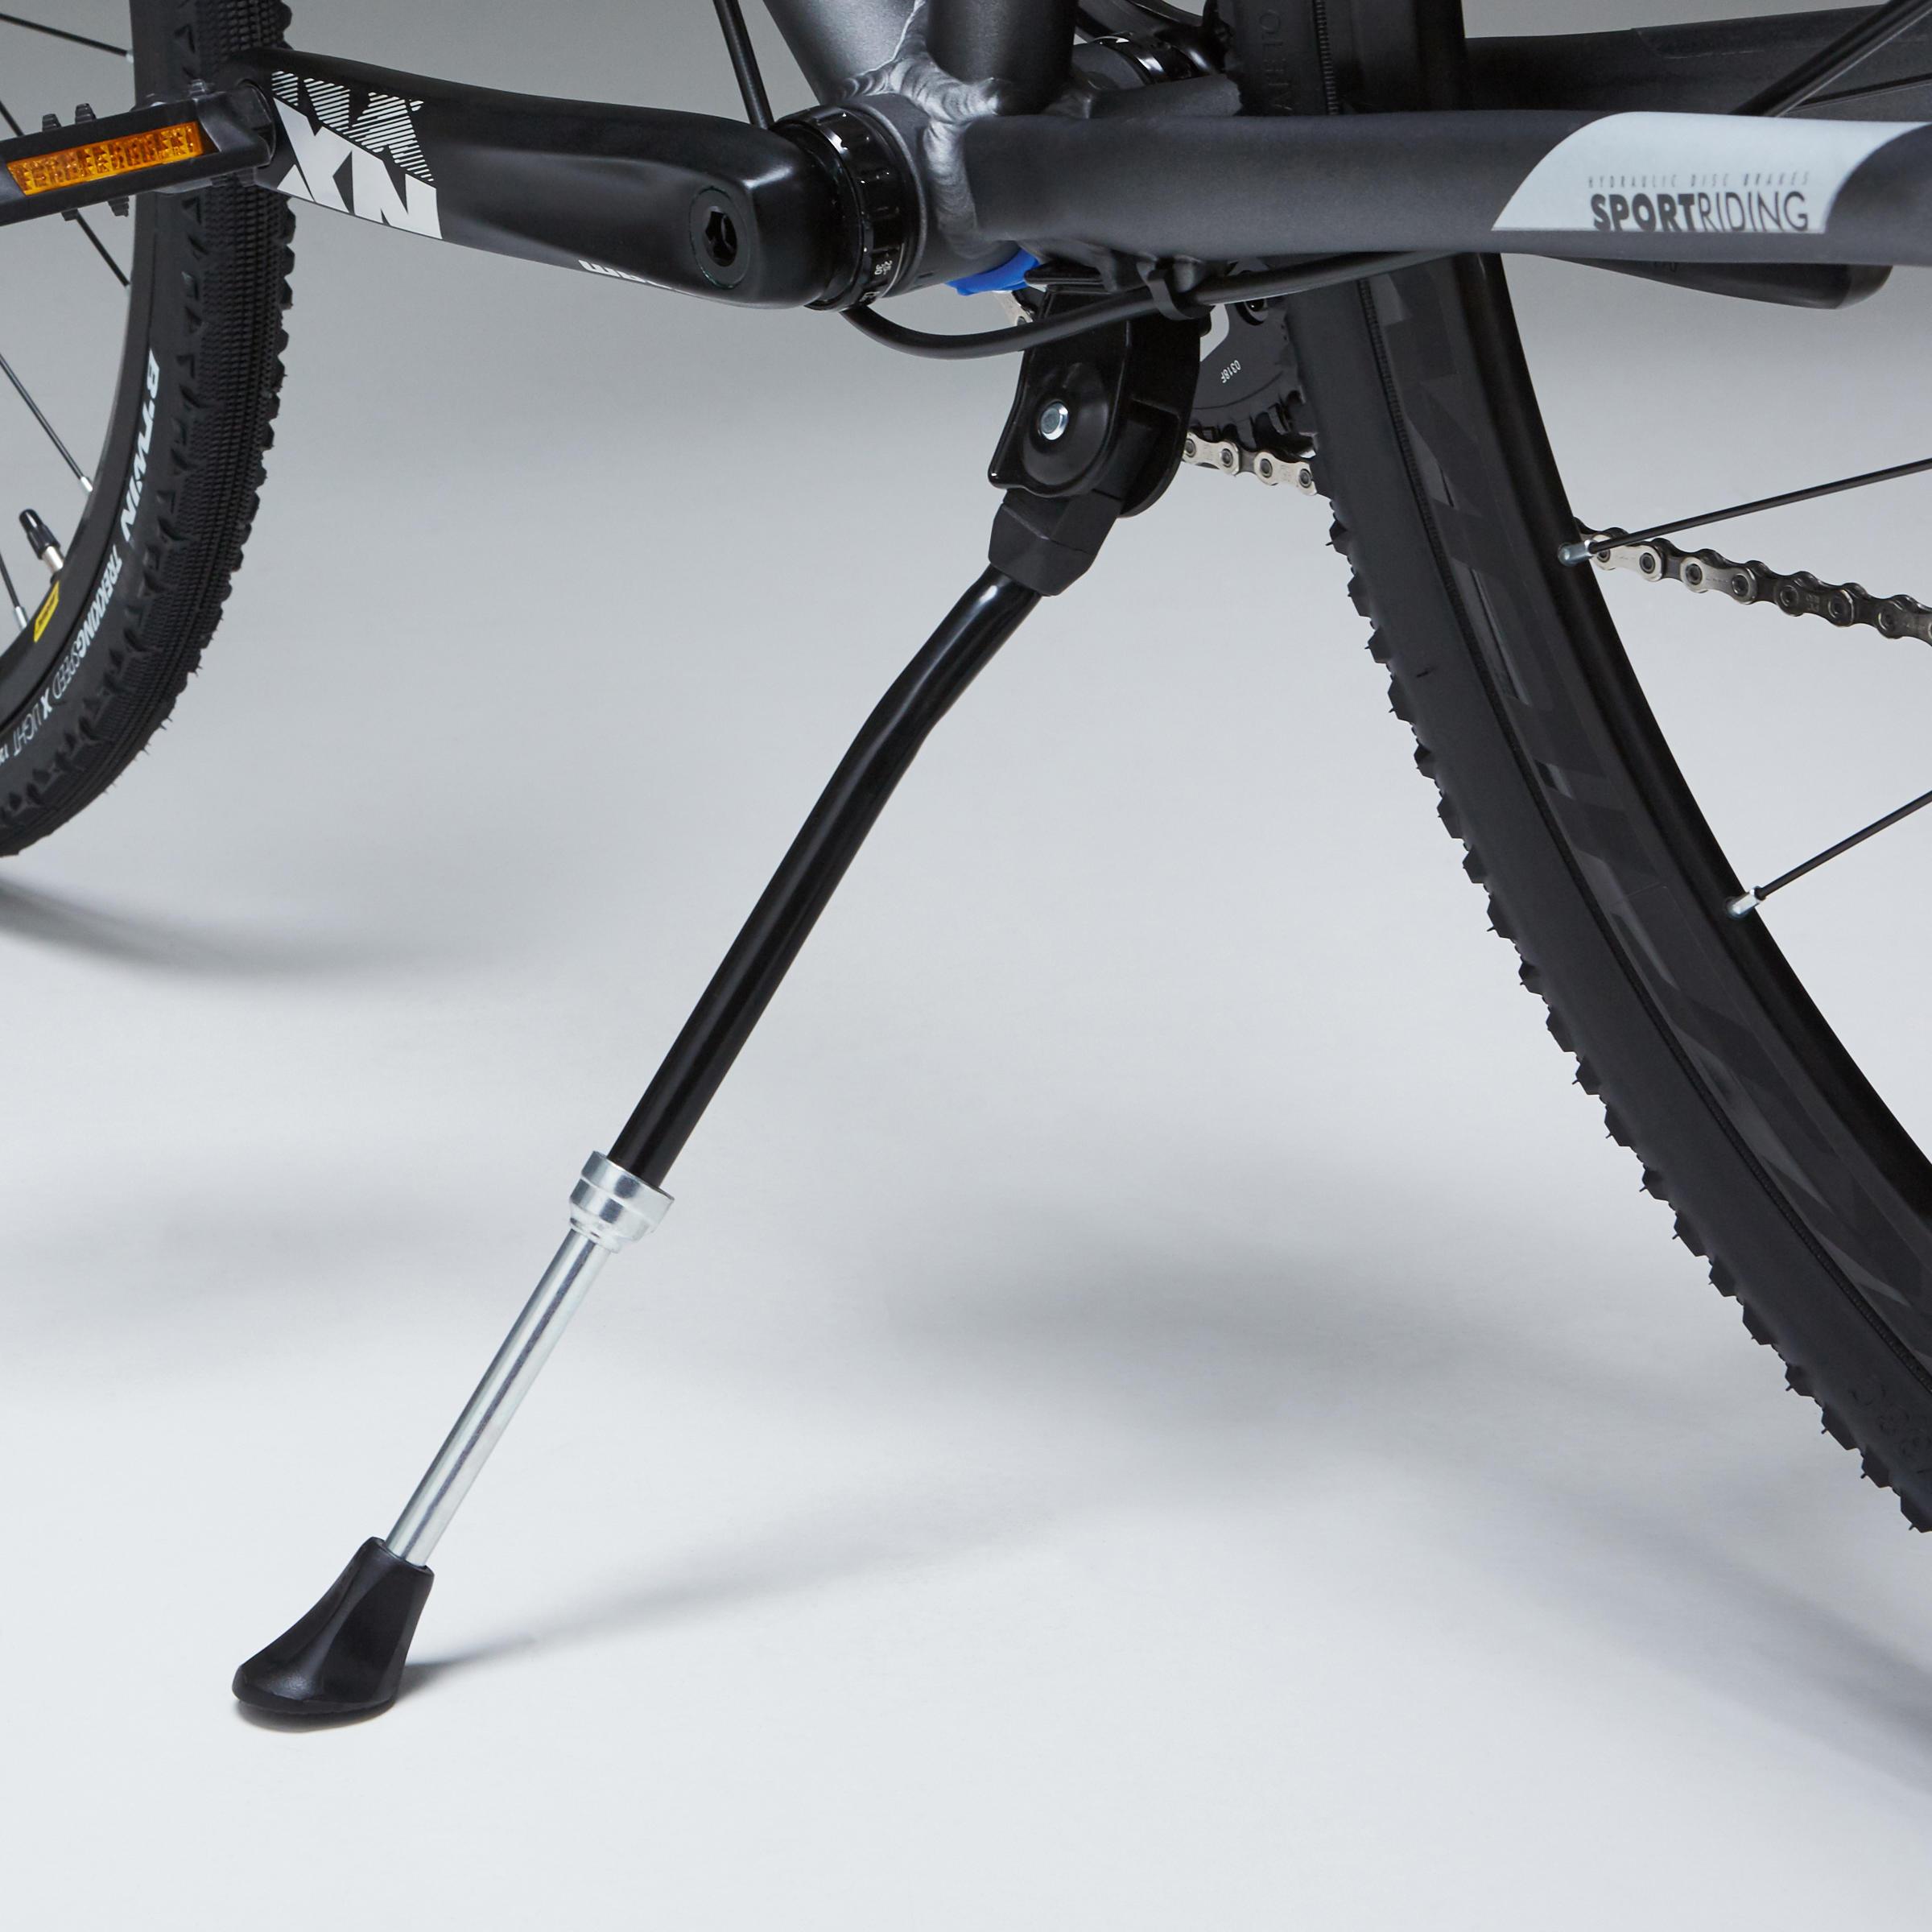 300 Adult Bike Stand